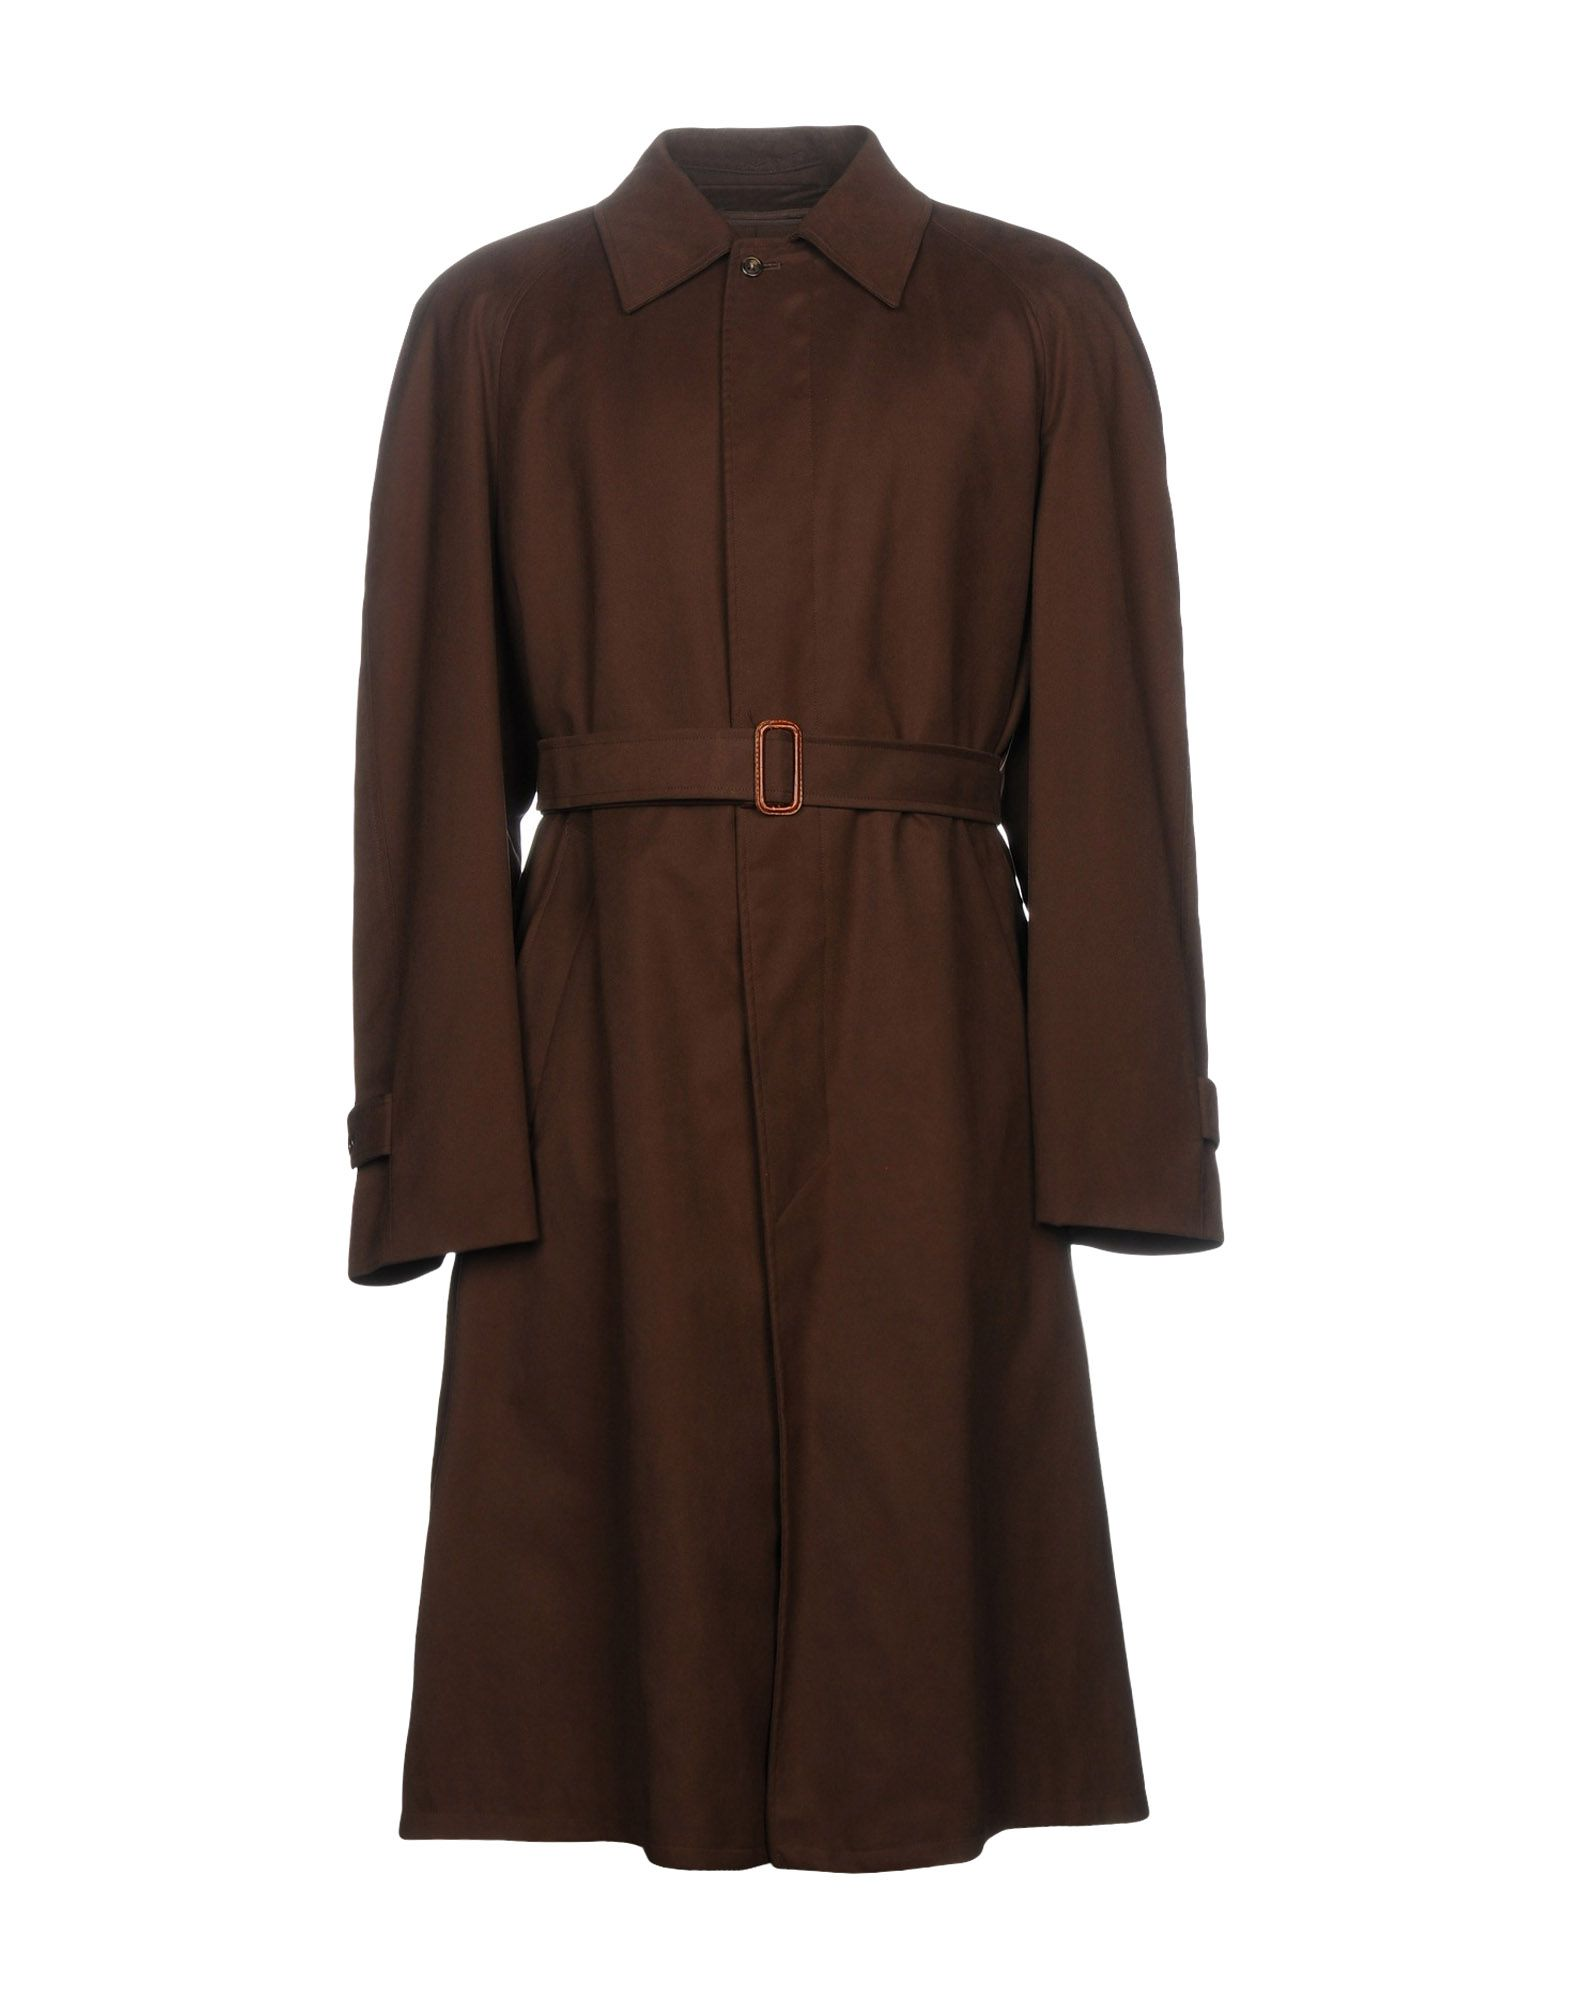 VALSTAR Coat in Cocoa